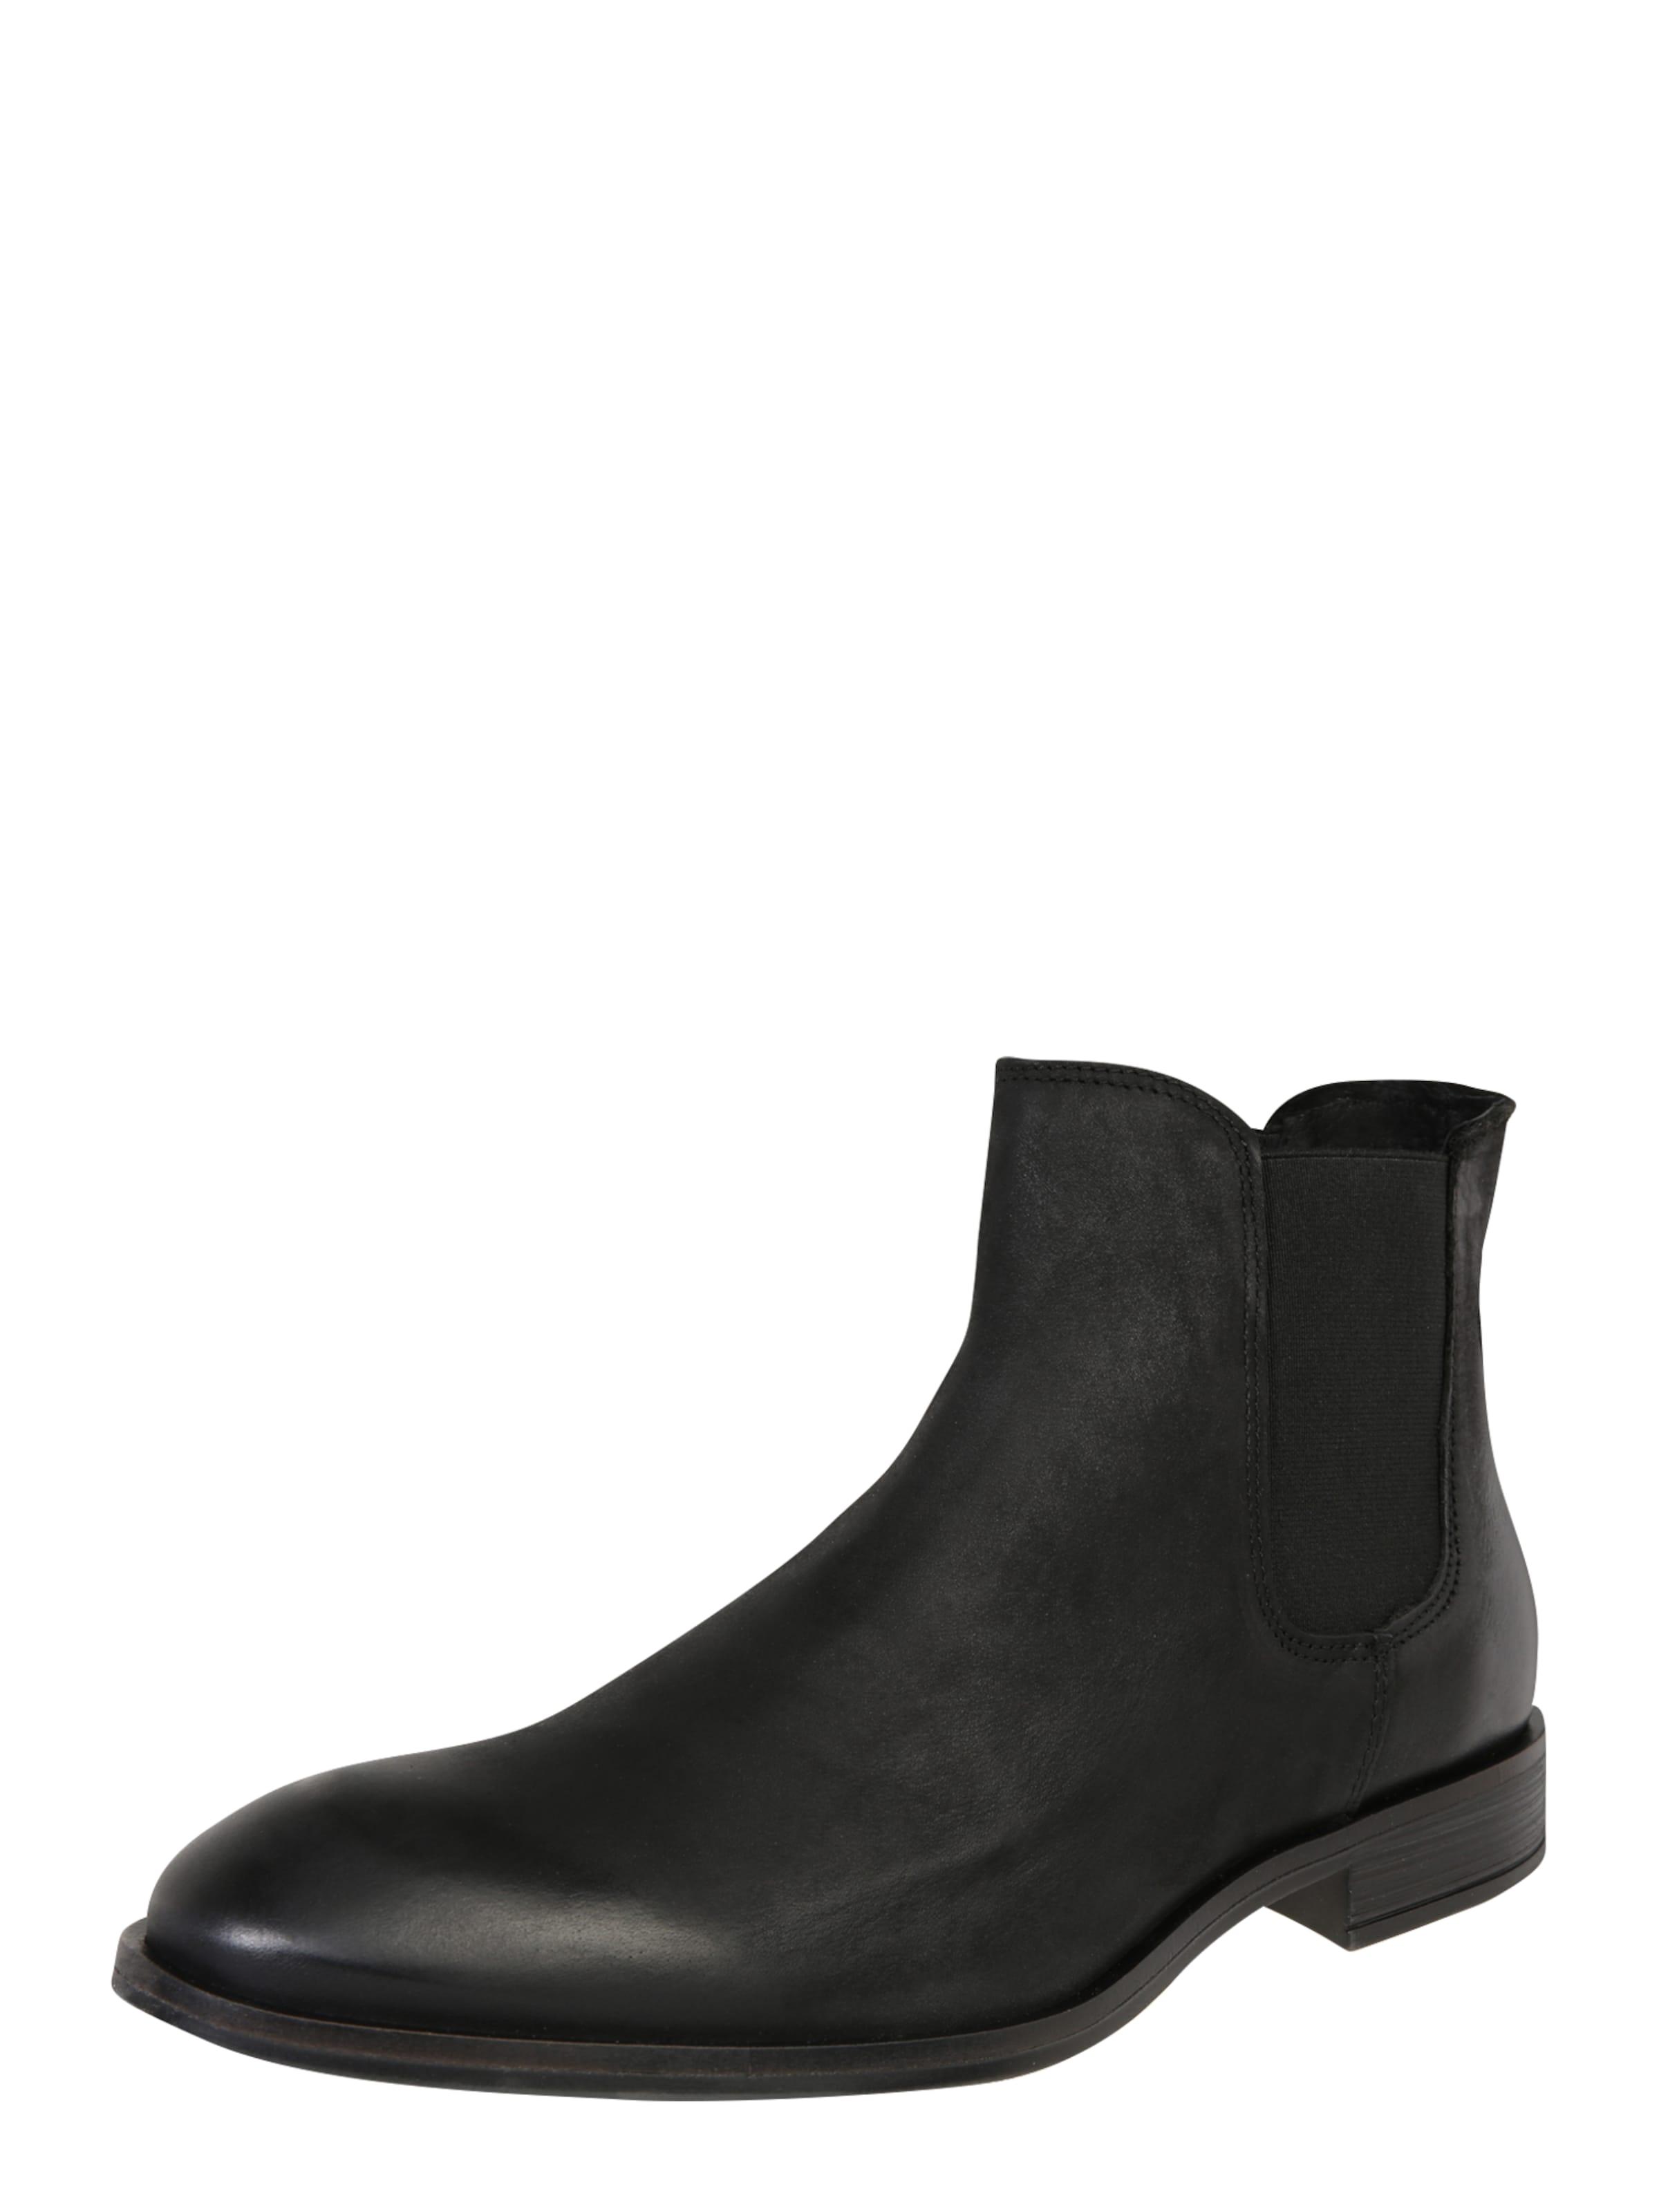 Bianco Chelsea En Noir Boots Bianco Boots En Chelsea Noir 5RL4jA